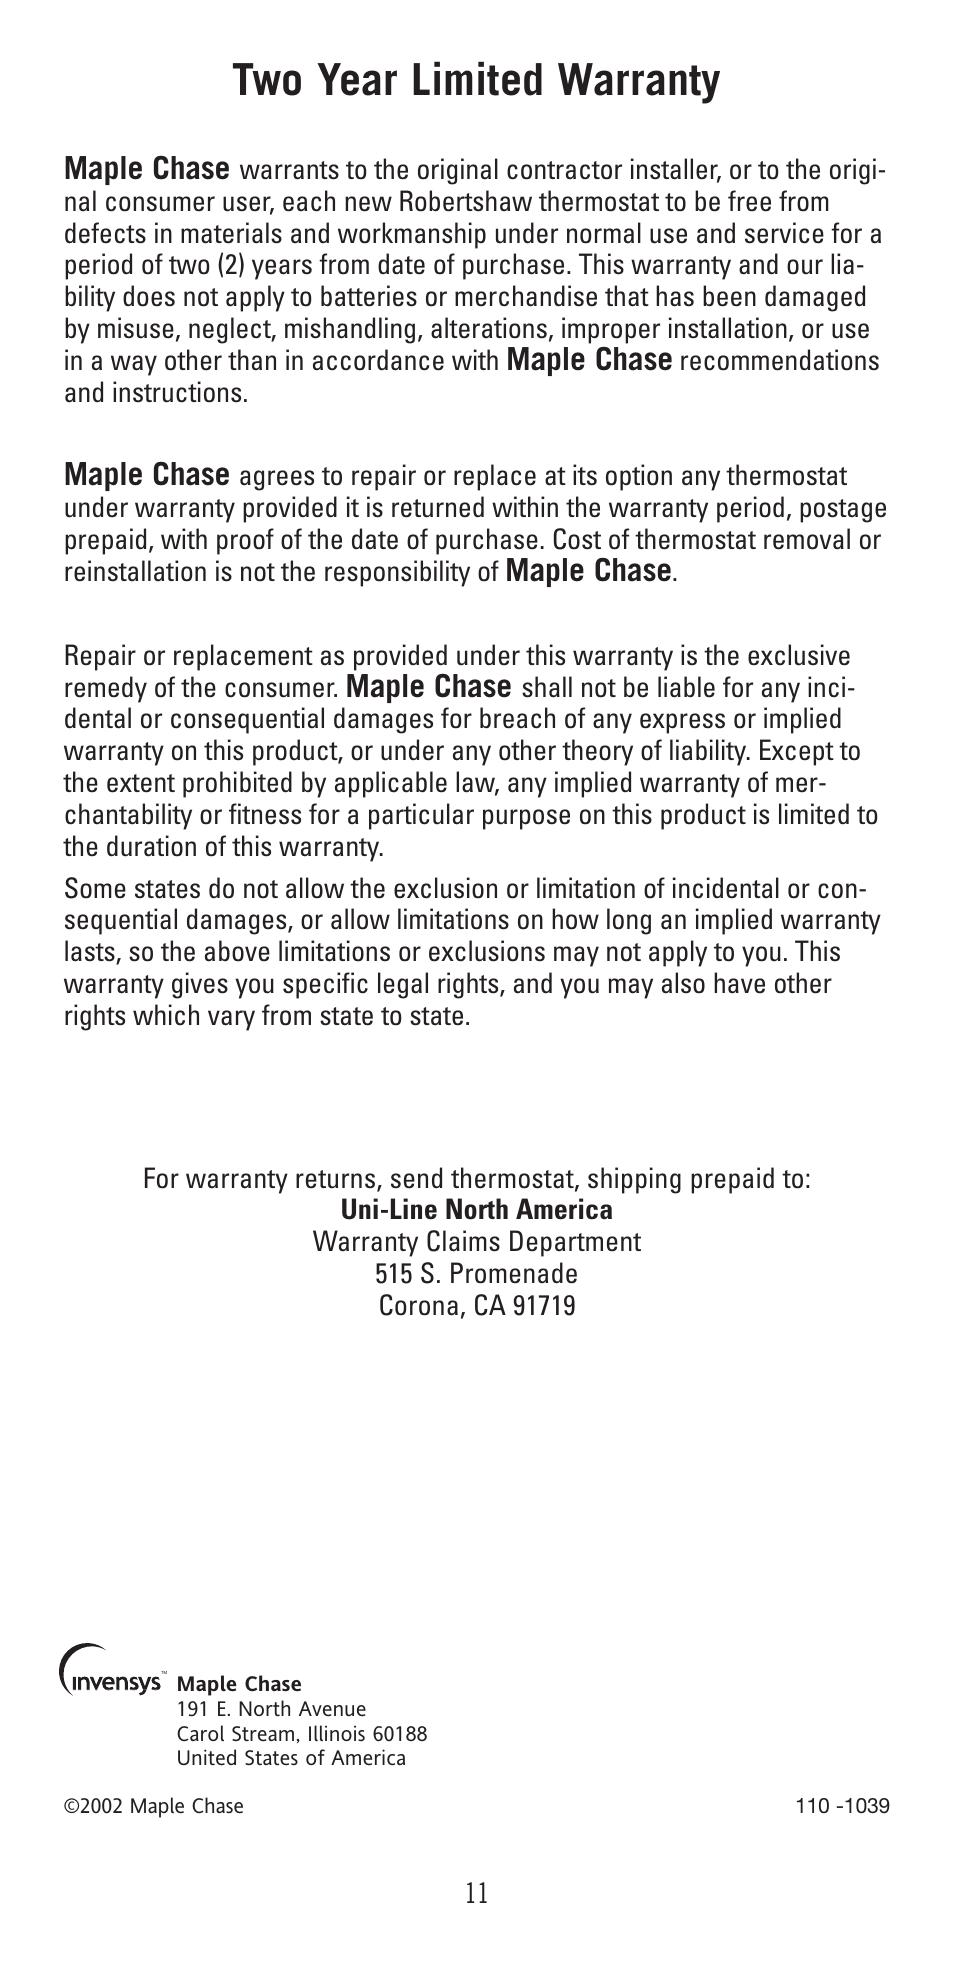 Two Year Limited Warranty Robertshaw 9400 User Manual border=